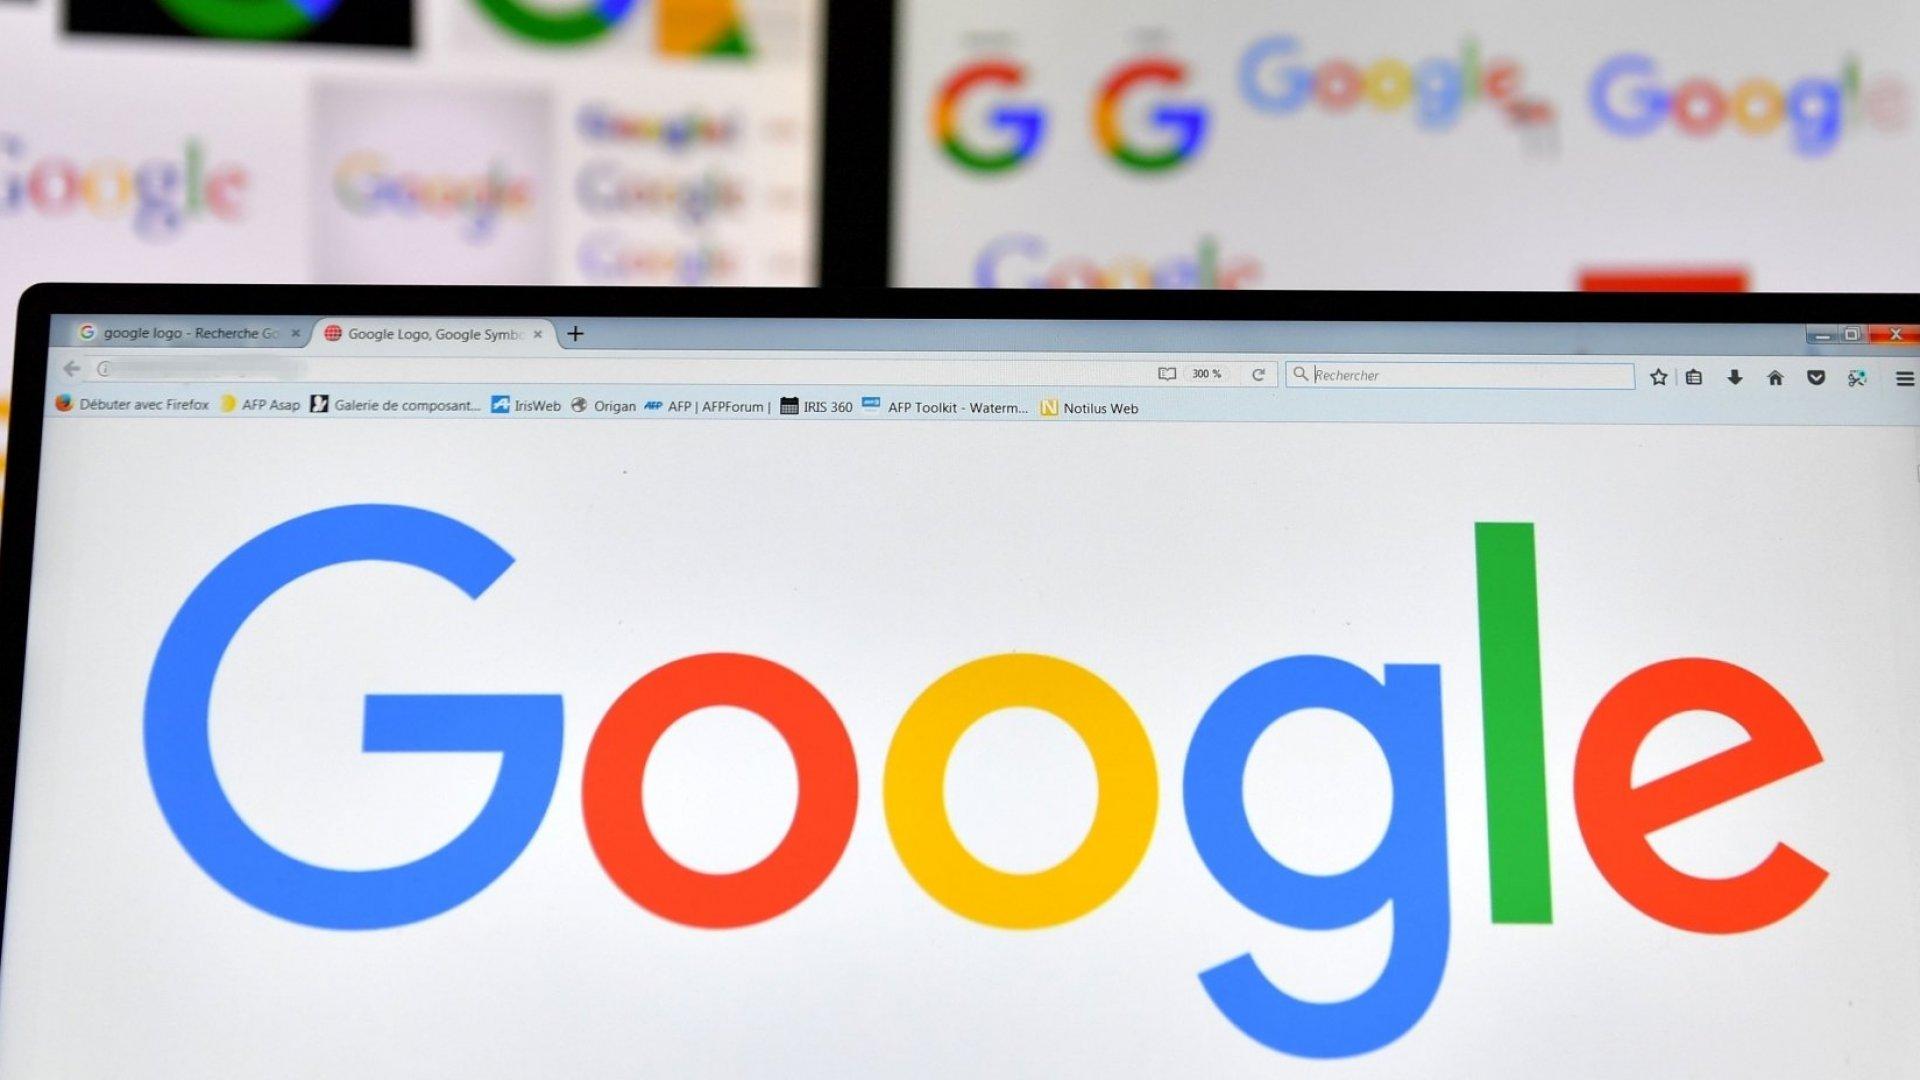 Google's Tiny Secret for Actually Impactful Employee Training